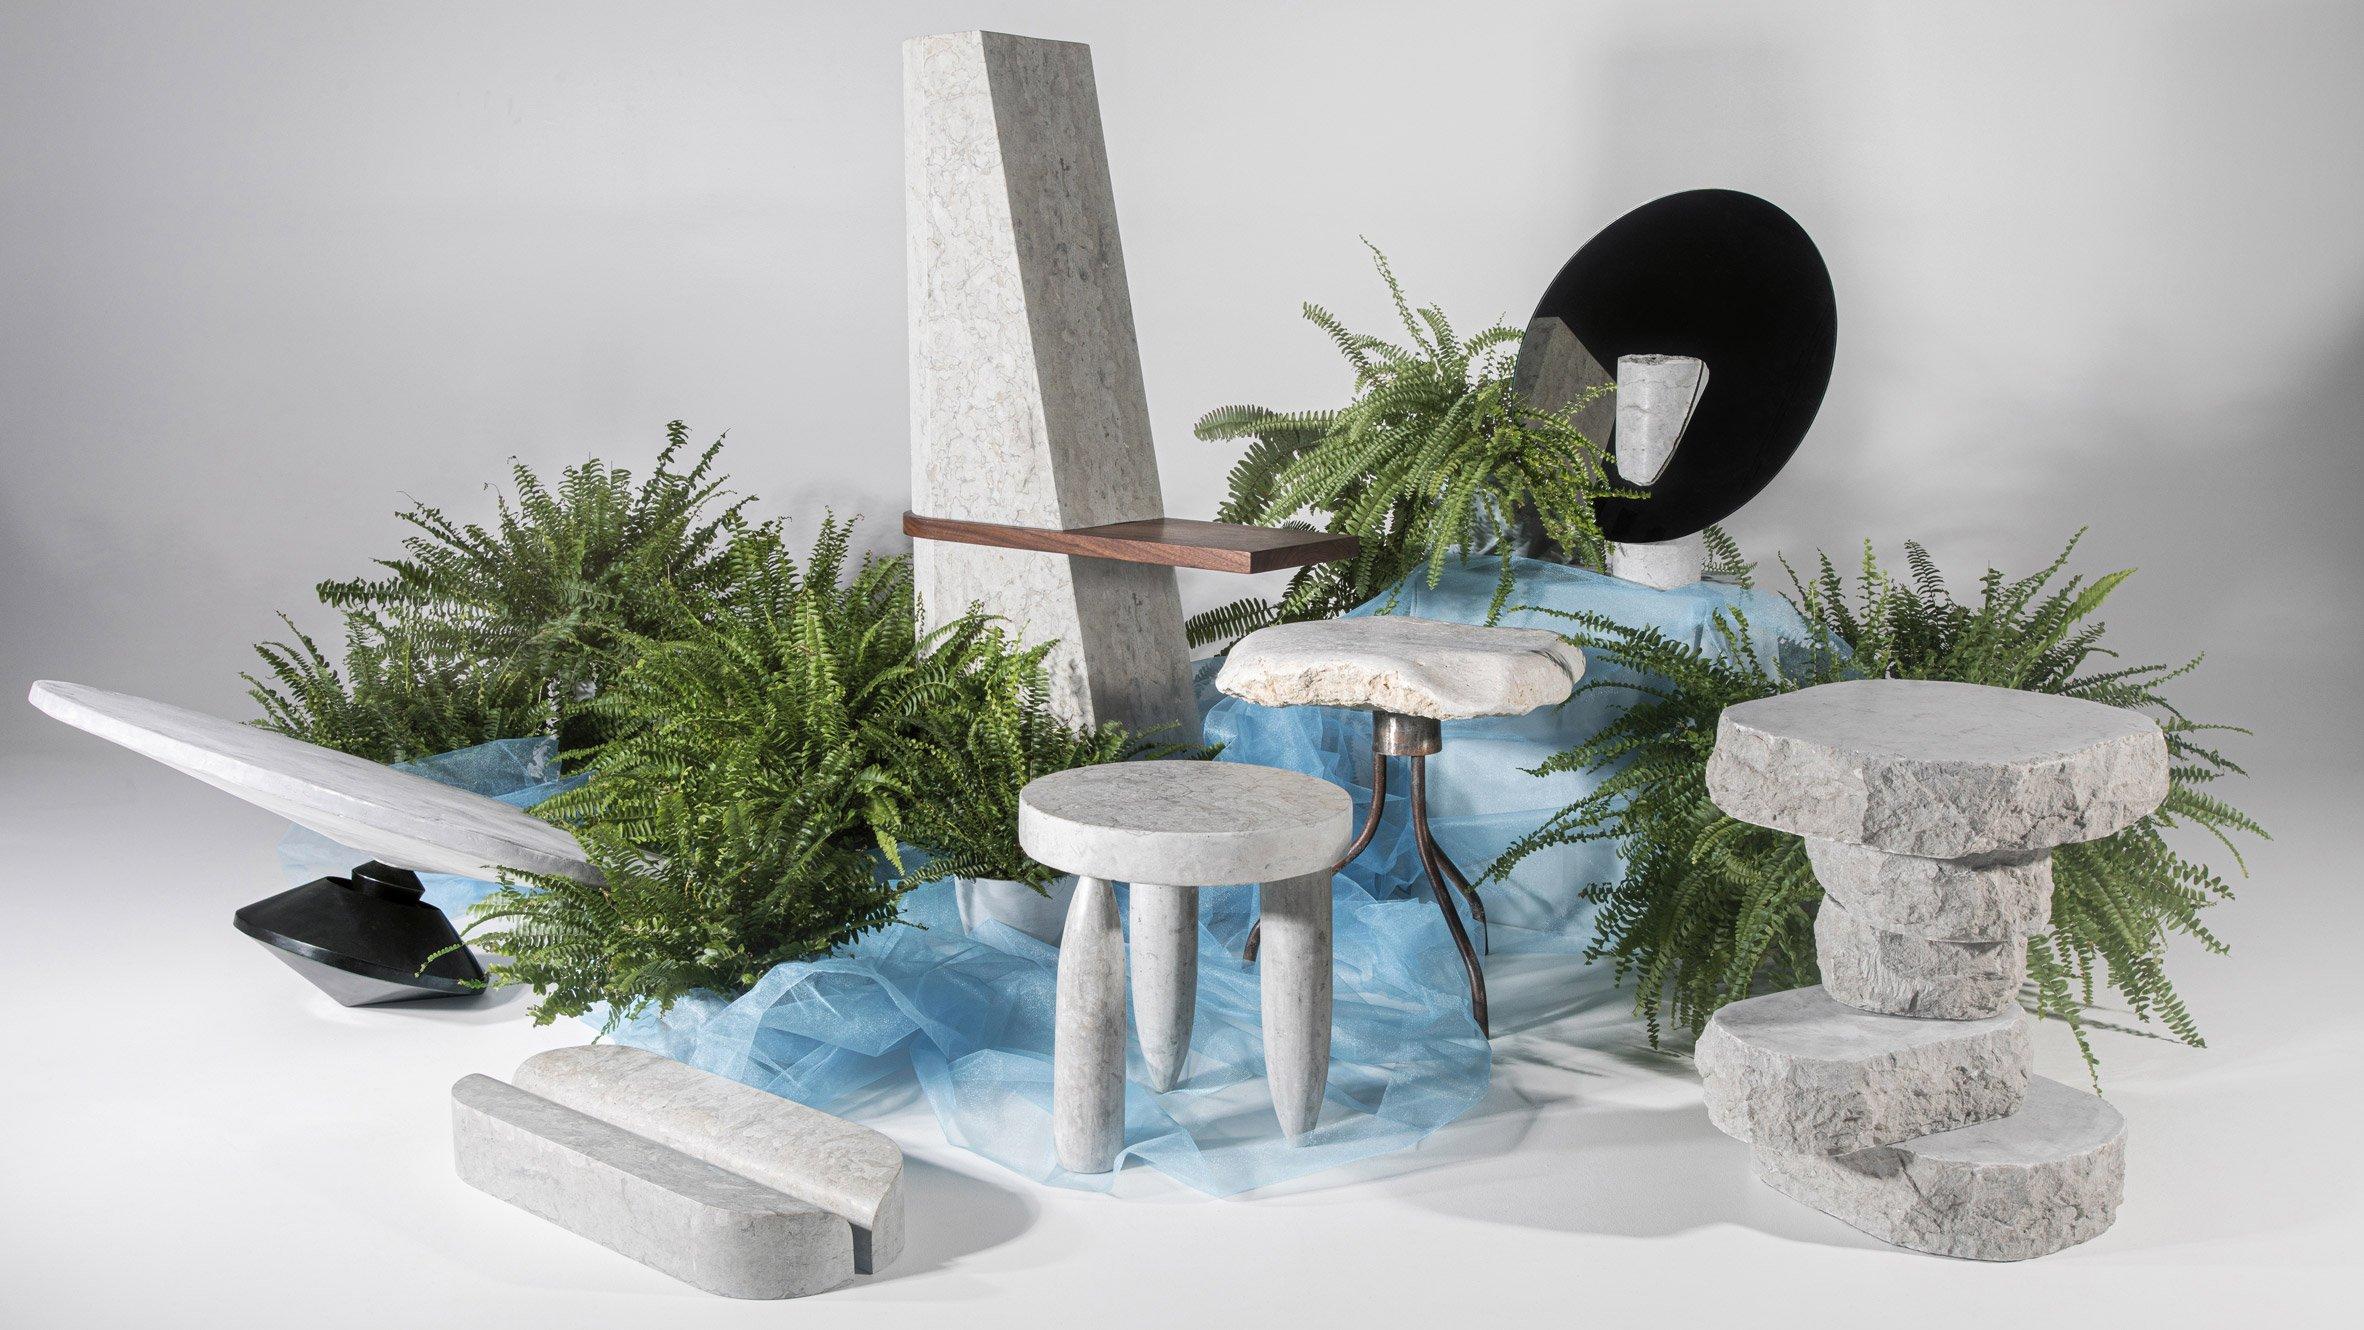 Limestone furniture by Estonian Academy of Arts students